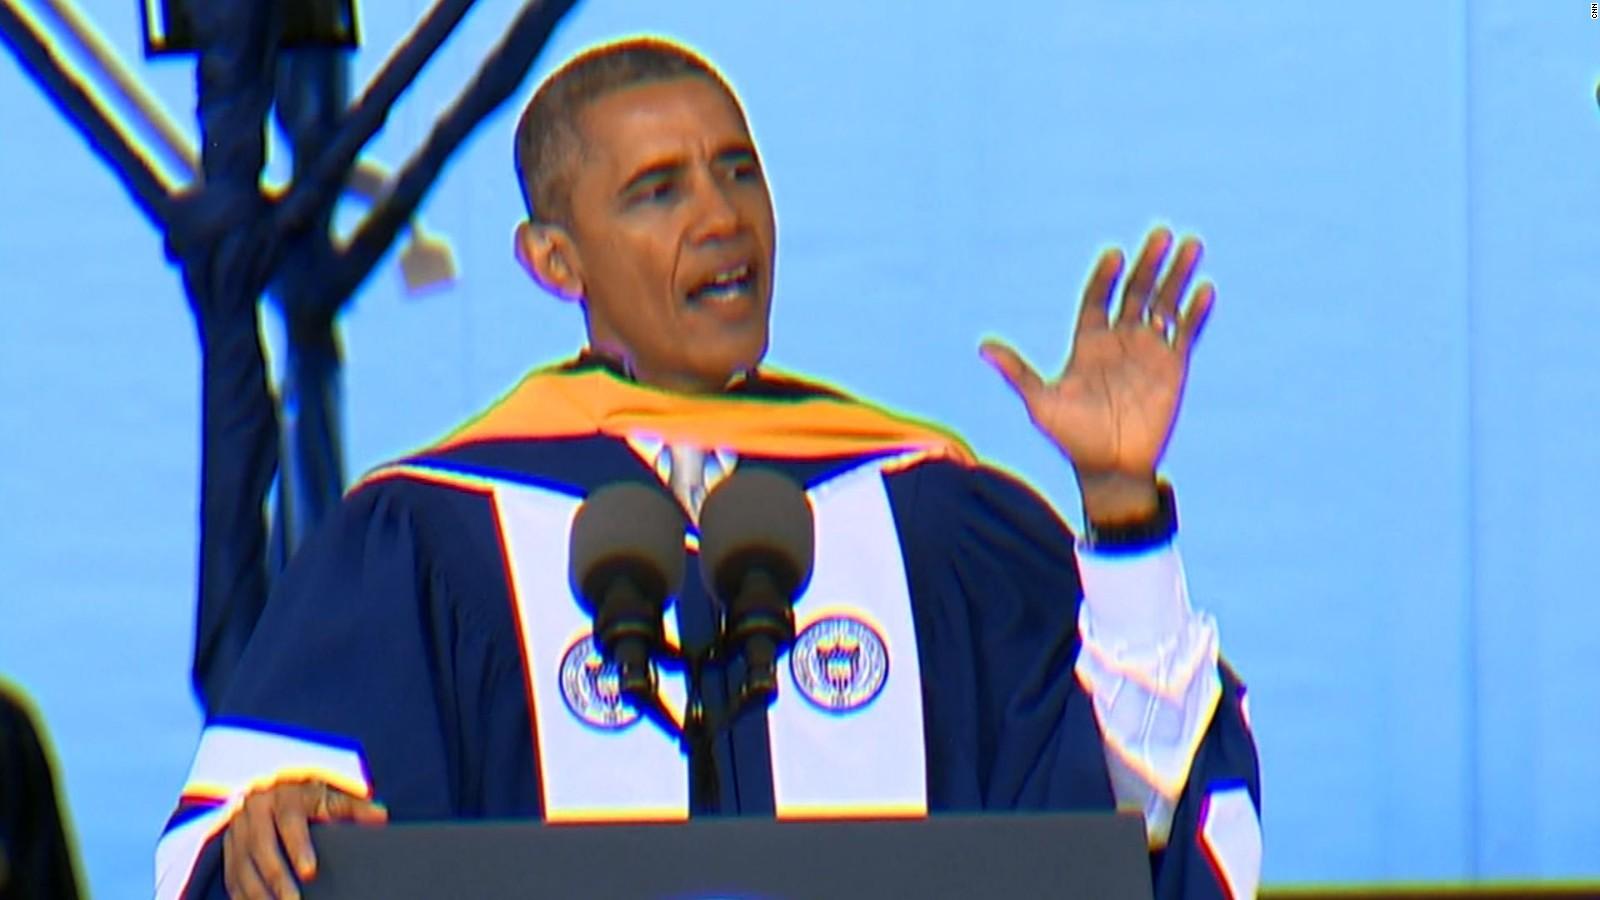 barack obama presidency what black america won t miss barack obama presidency what black america won t miss politics com